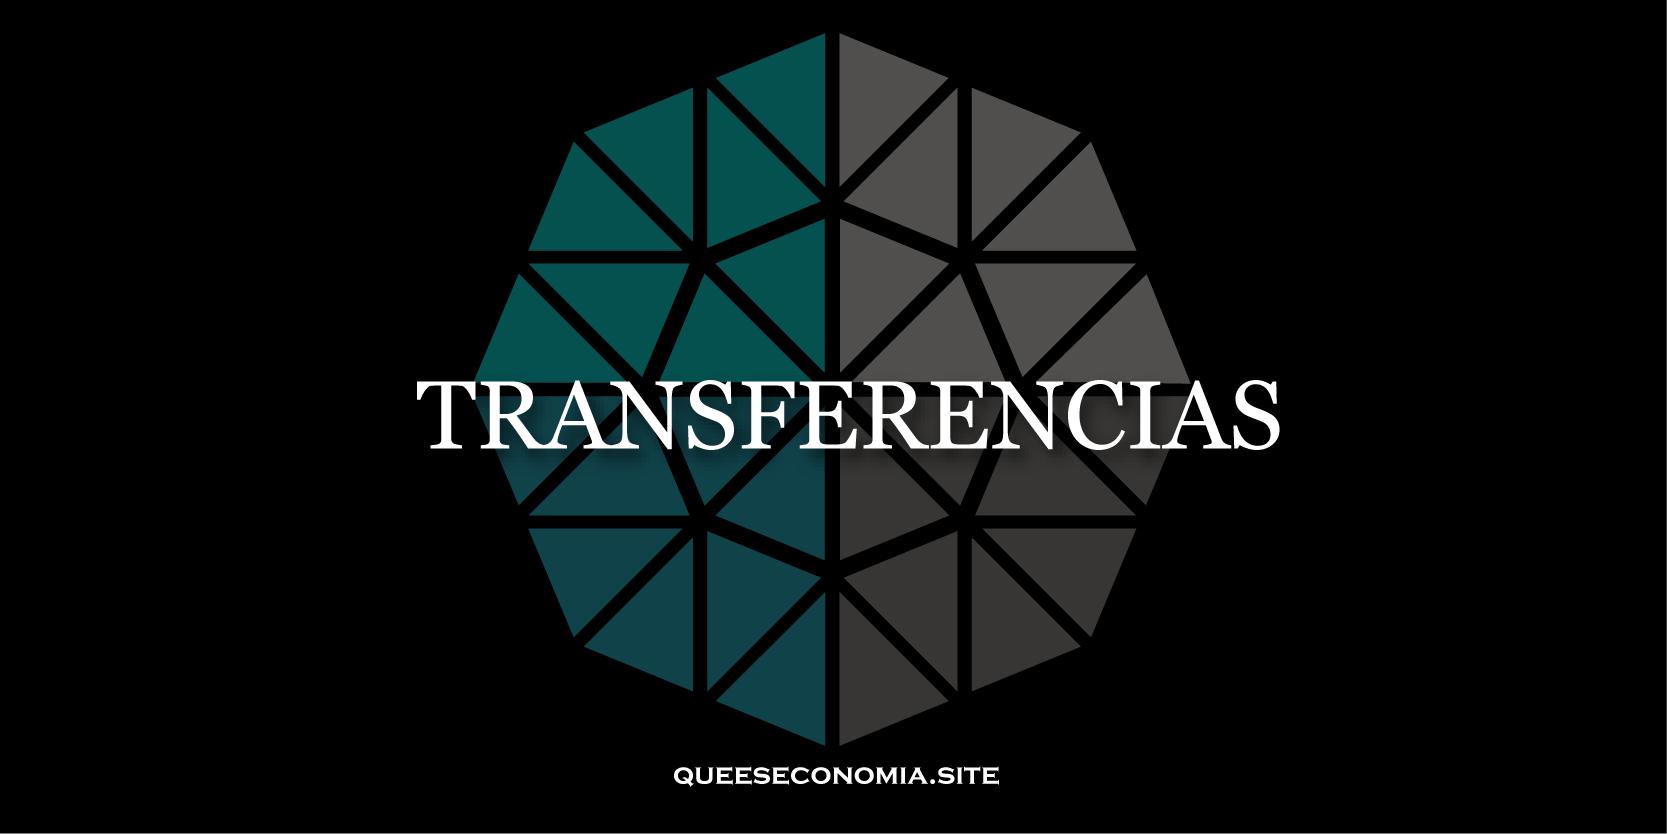 transferencias